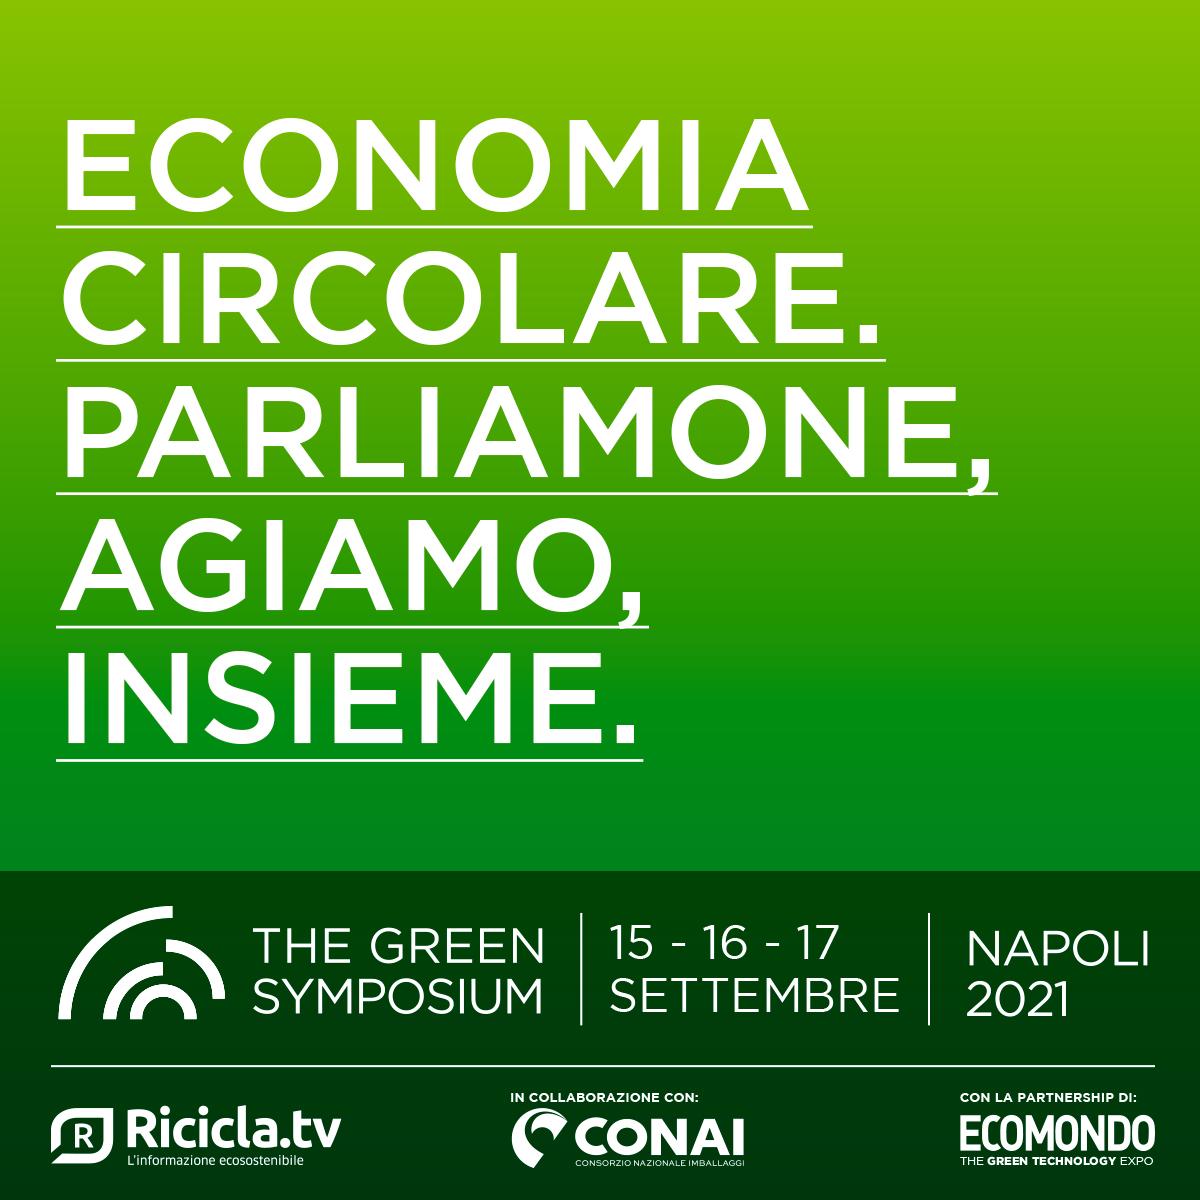 The Green Symposium - Economia circolare. Parliamone, agiamo, insieme